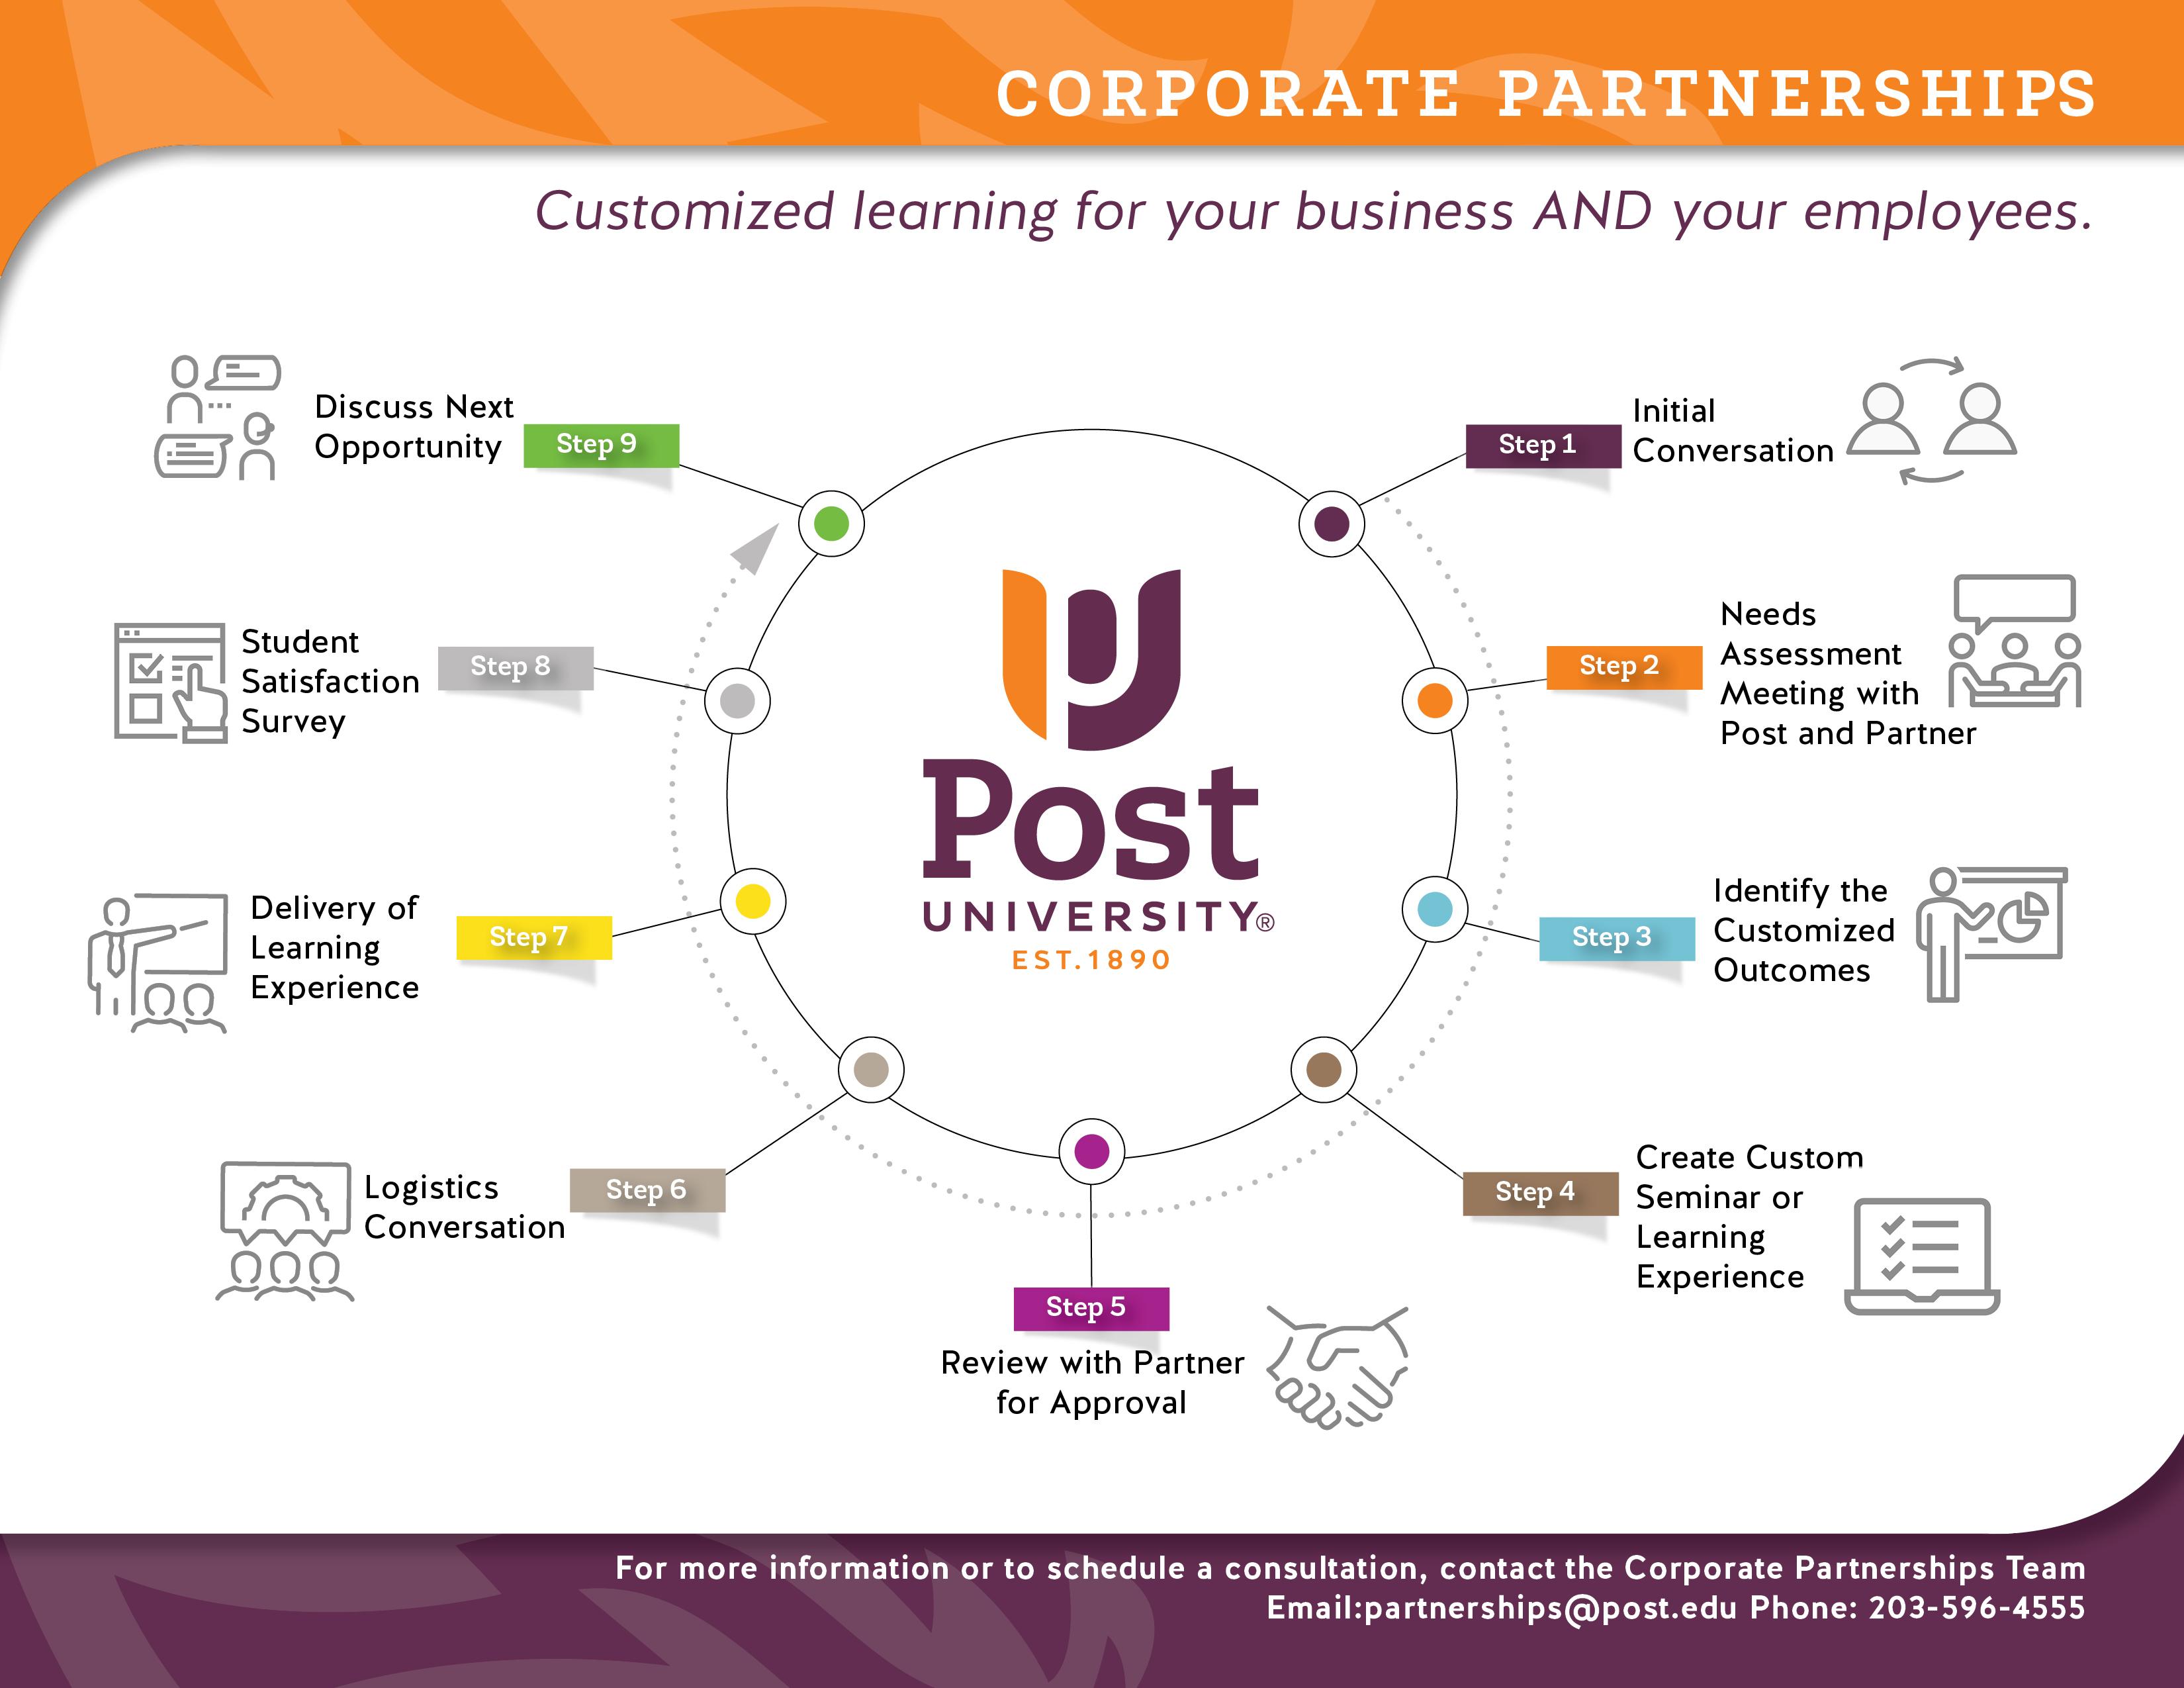 POST Corporate Partnership